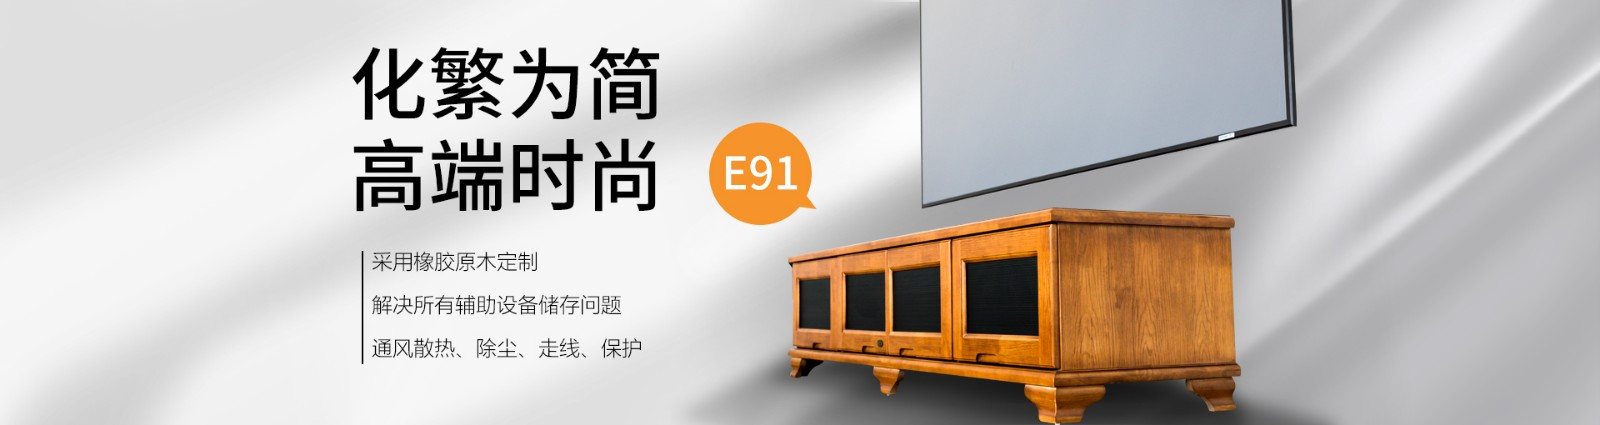 E-JOIN猛犸客厅机柜E91-Y2000W-G01投影机内置激光电视专用柜影音设备柜橡胶木定制 香槟金 2000*495*560mm